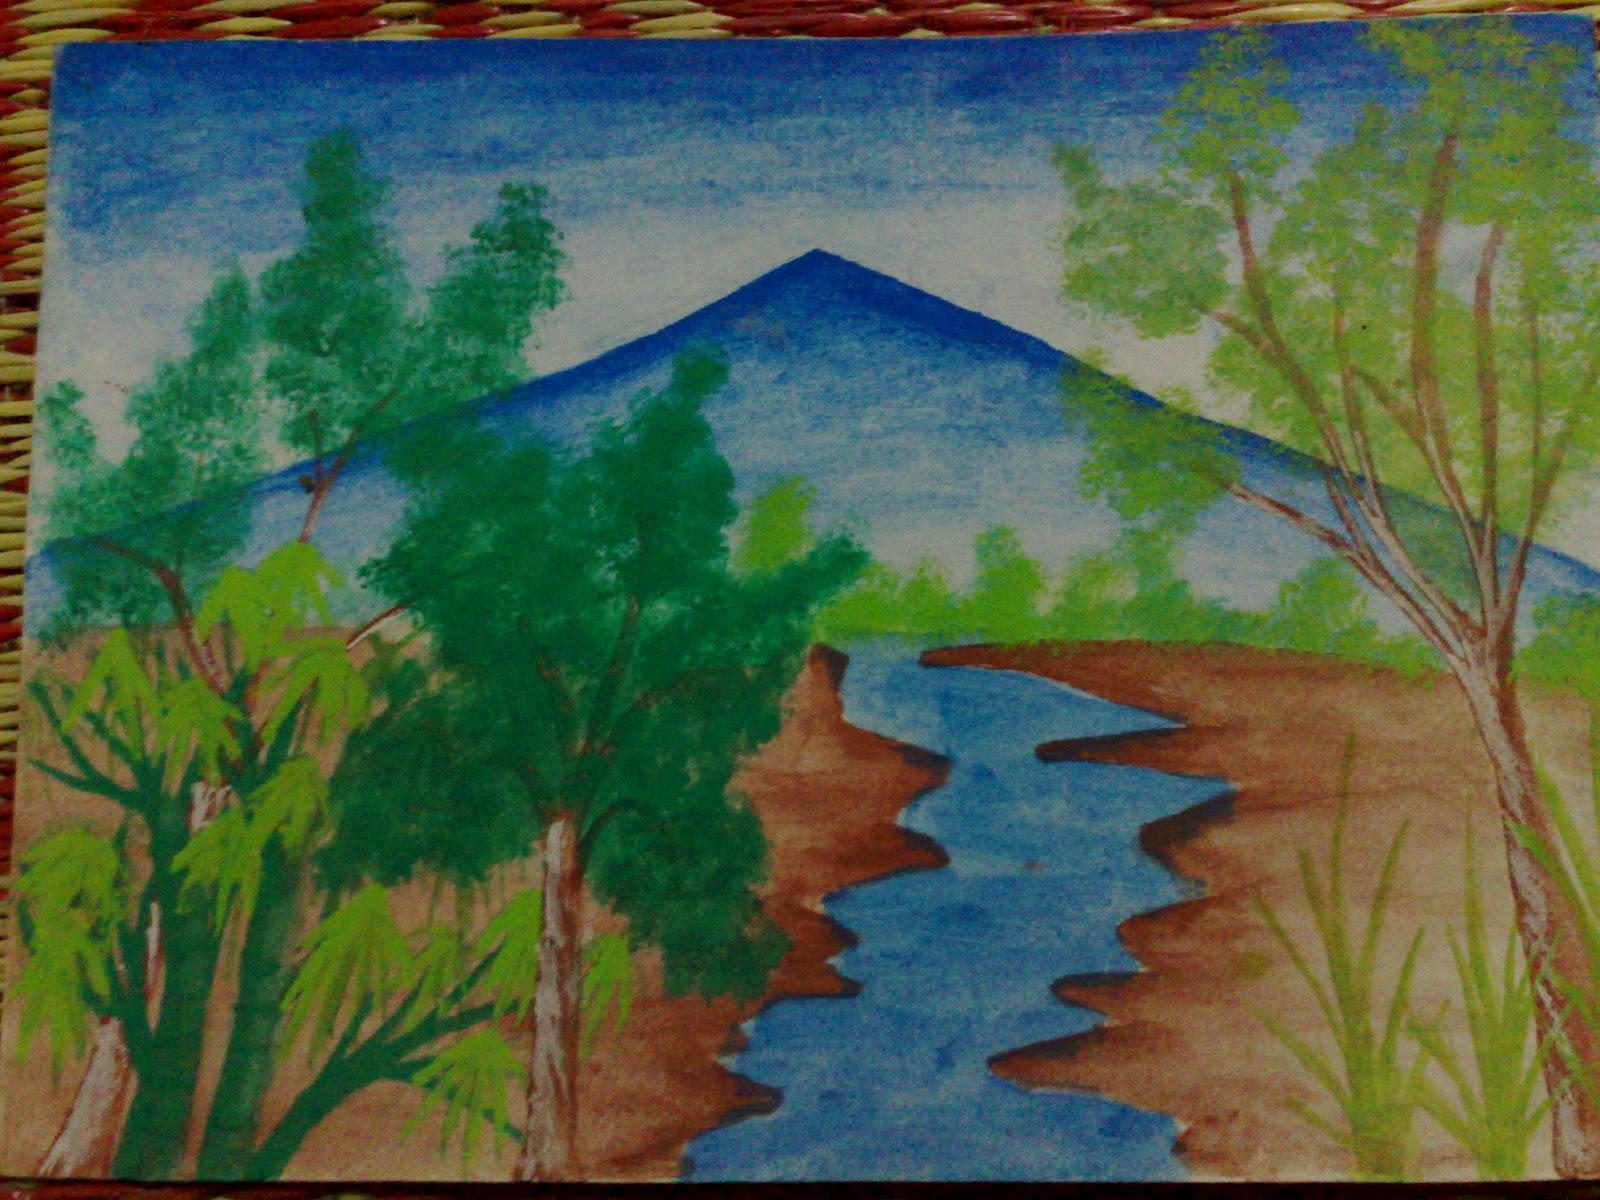 Lukisan Pemandangan Alam Anak Sd Bliblinews Ratnachochochieps Contoh Gambar